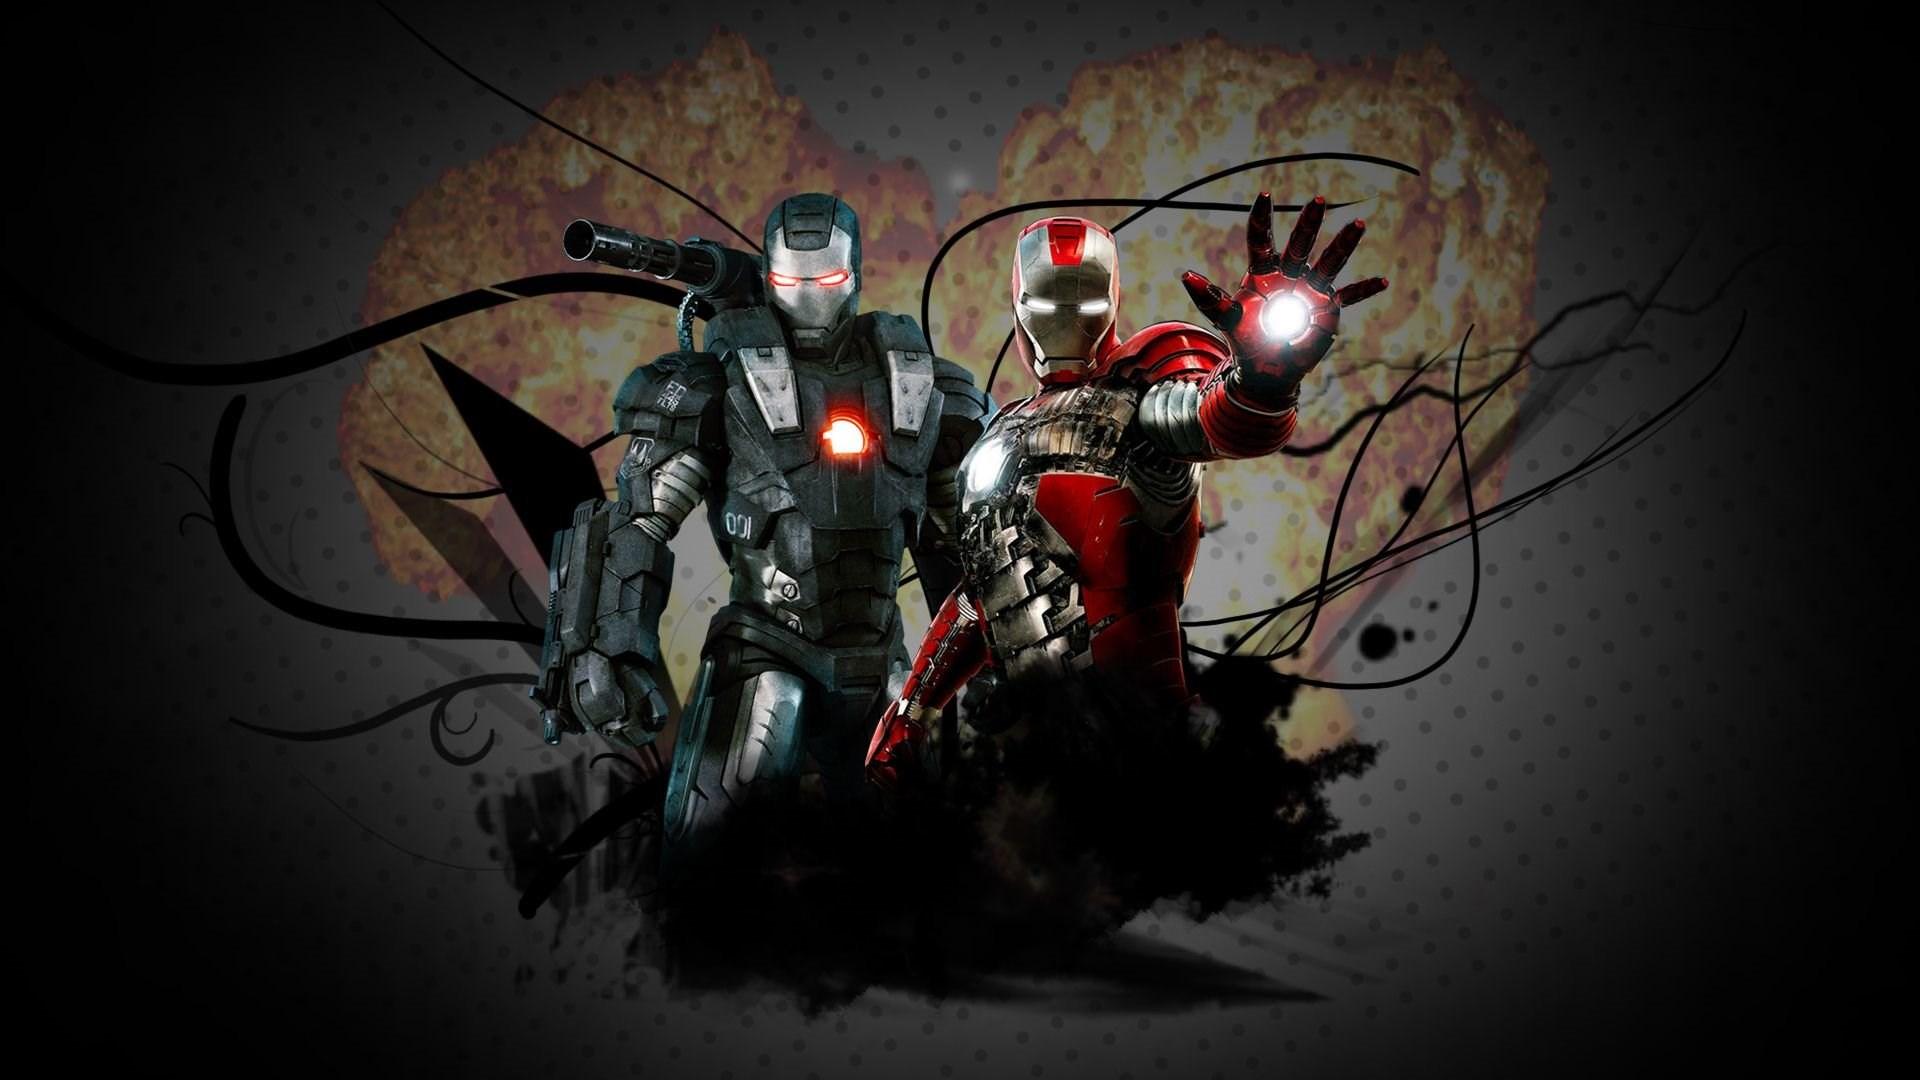 Iron Man Iron Man 2 Marvel Comics War Machine 1920x1080